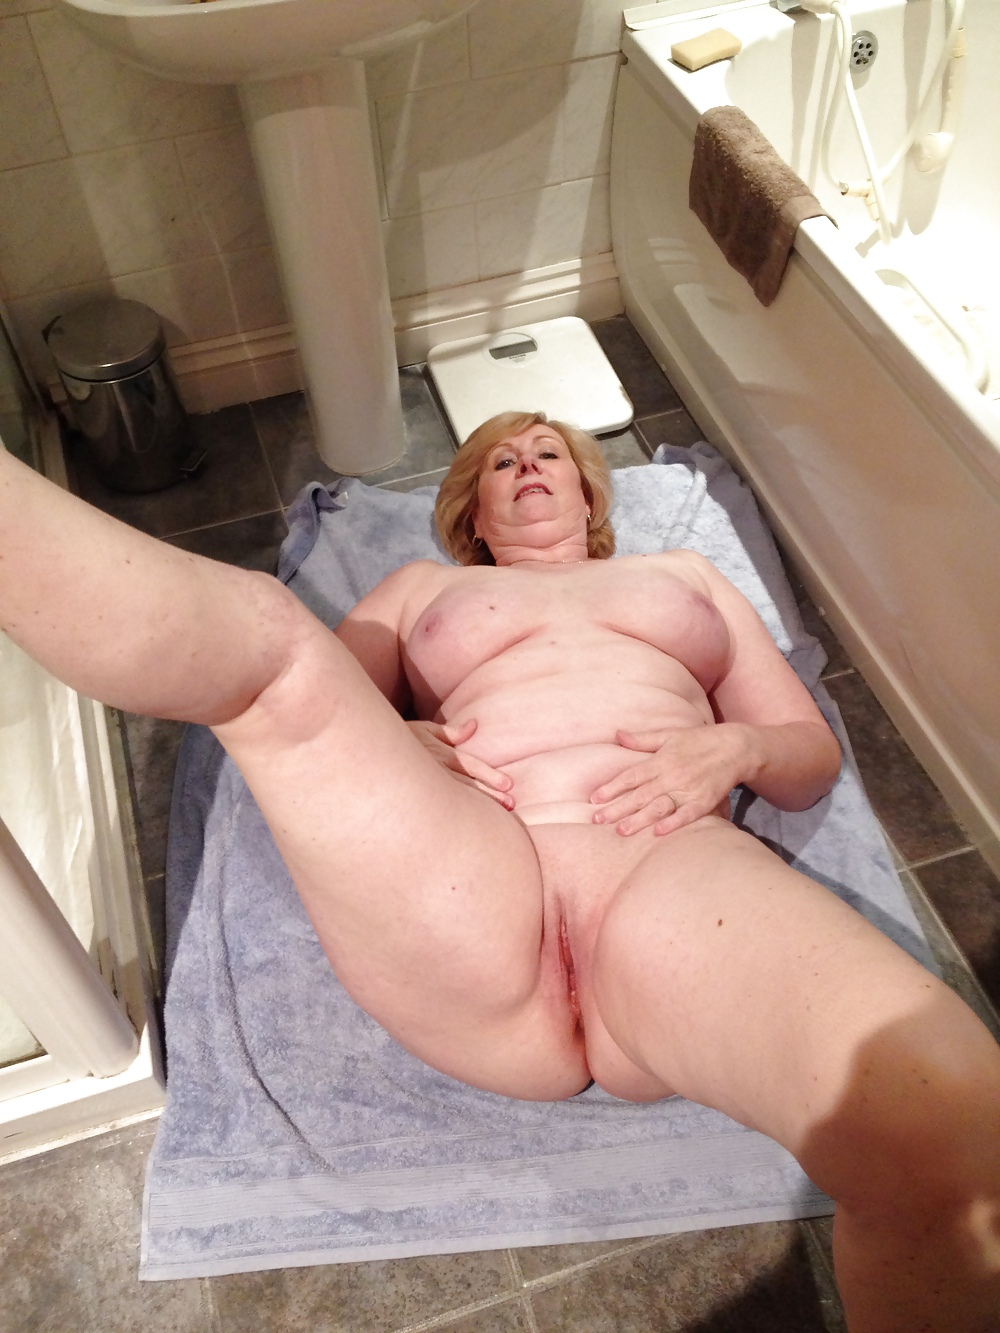 Get German Granny Bathroom Fuck Porn For Free